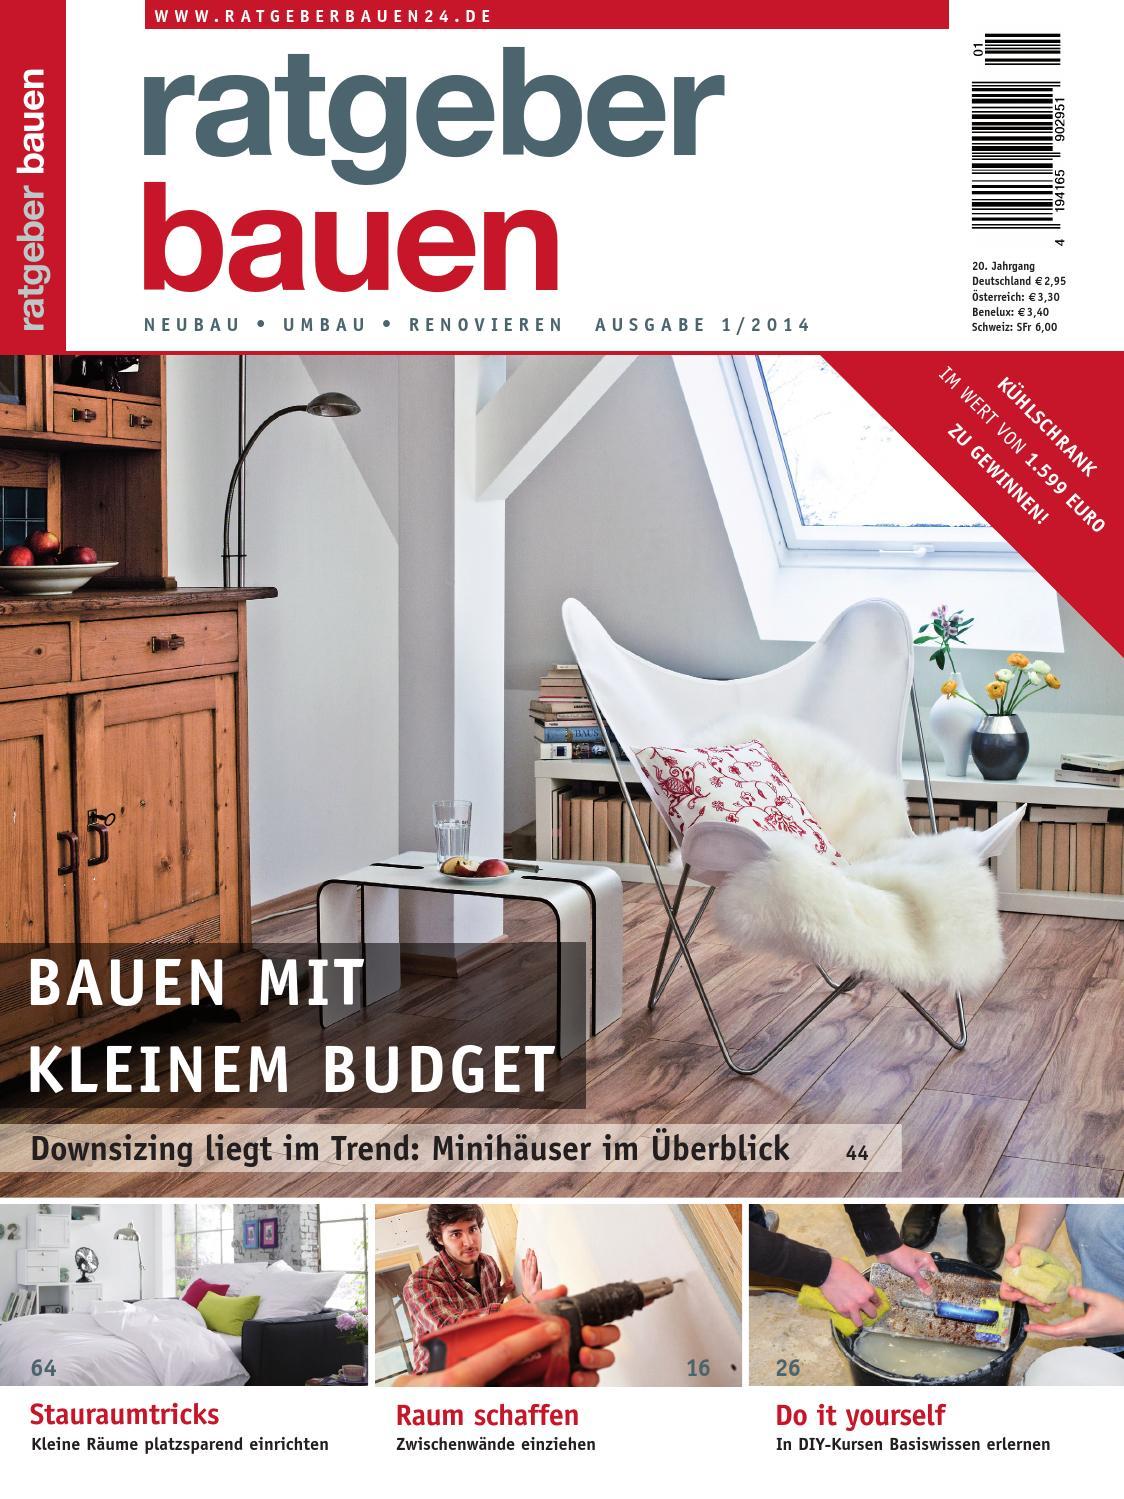 Ratgeber bauen 1 2014 by ratgeber bauen issuu for Ratgeber bauen